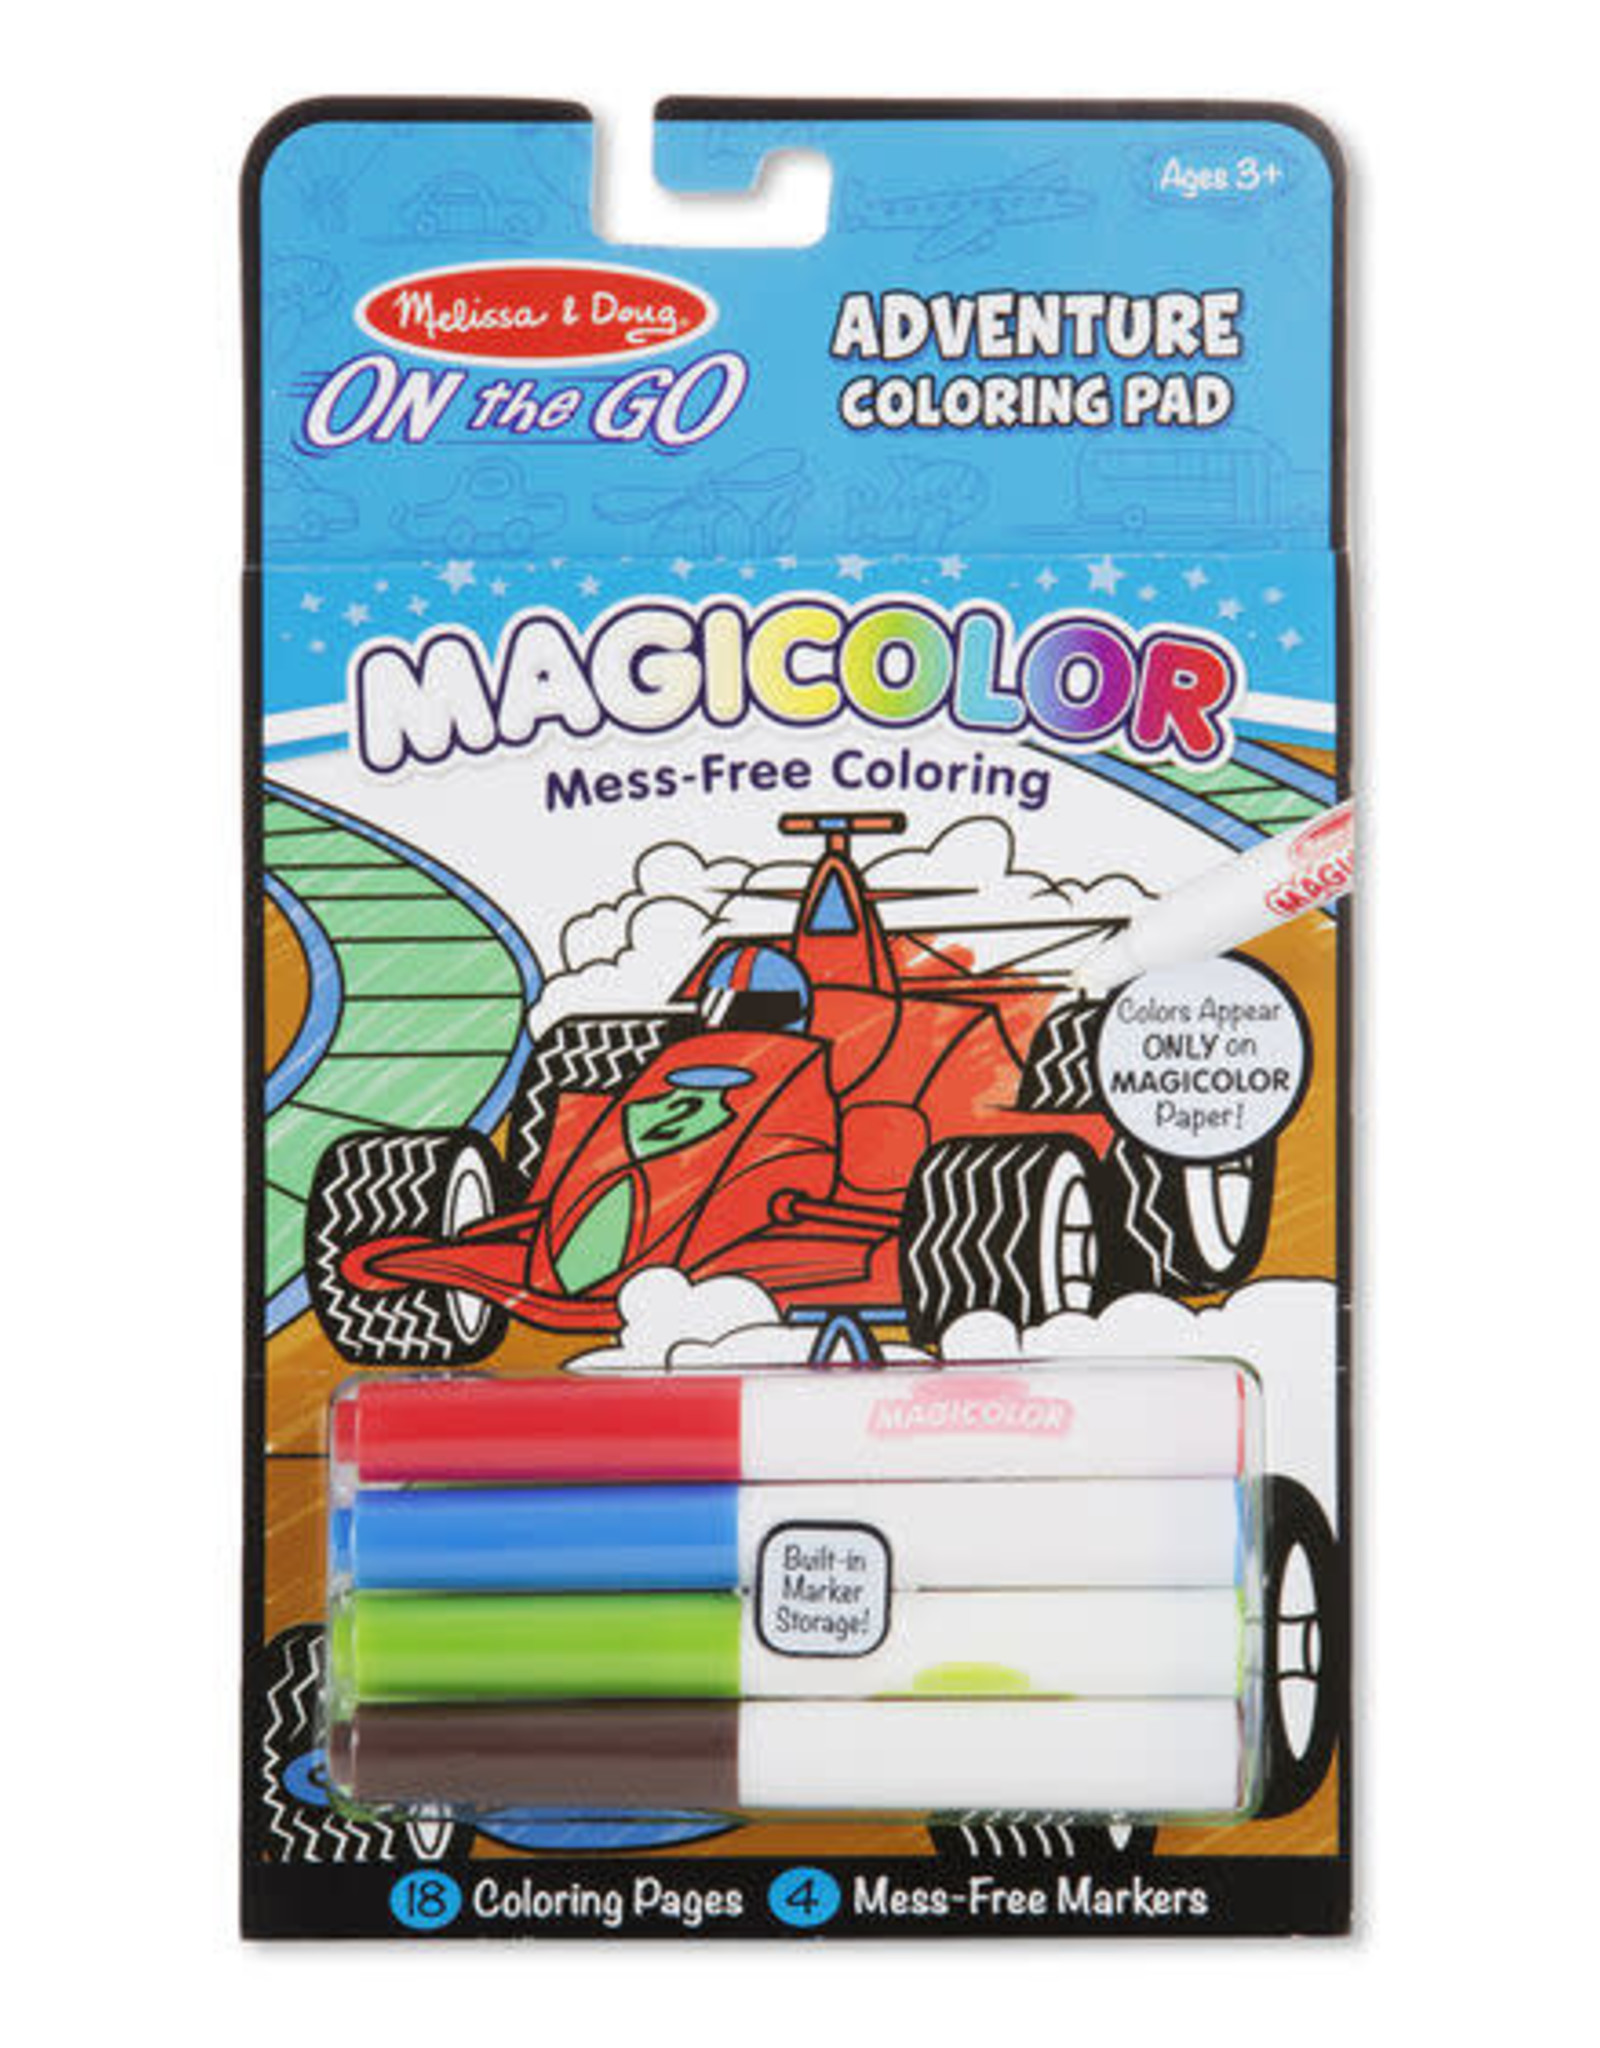 Melissa & Doug Melissa & Doug Magicolor Coloring Pad - Games & Adventure